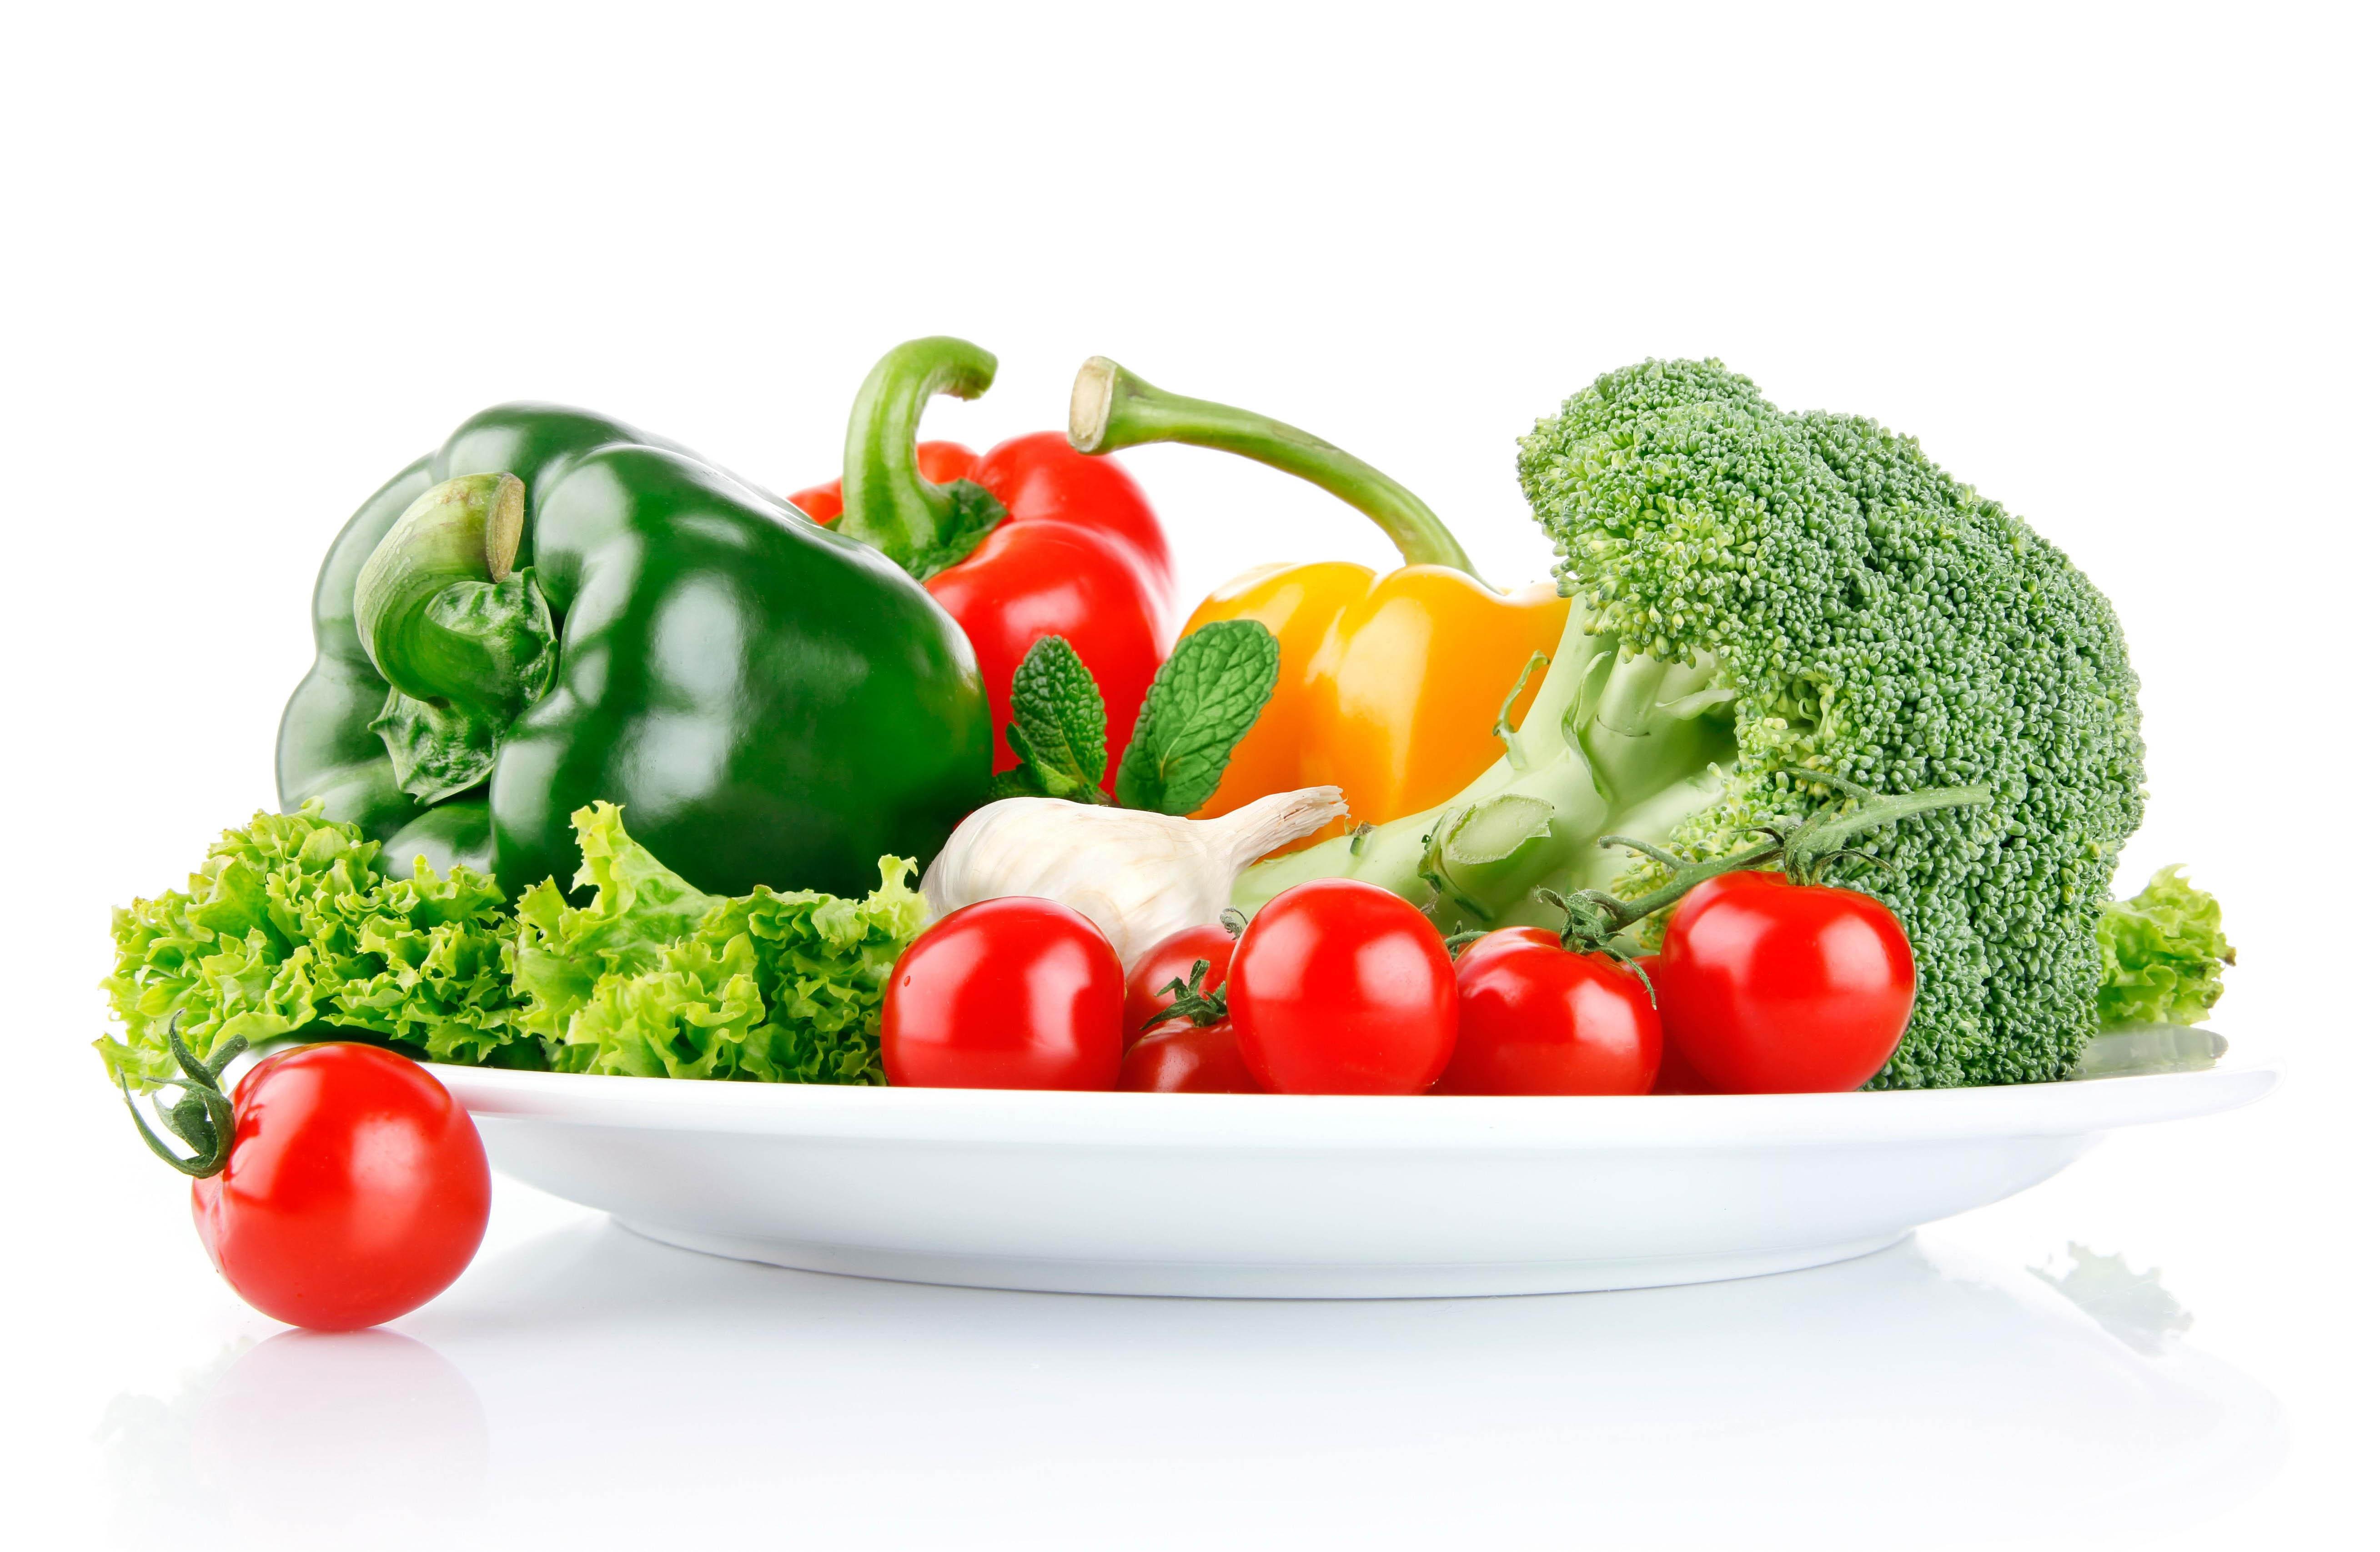 Goodfon Wallpaper Car Wallpaper Vegetables Dish White Background 5234x3412